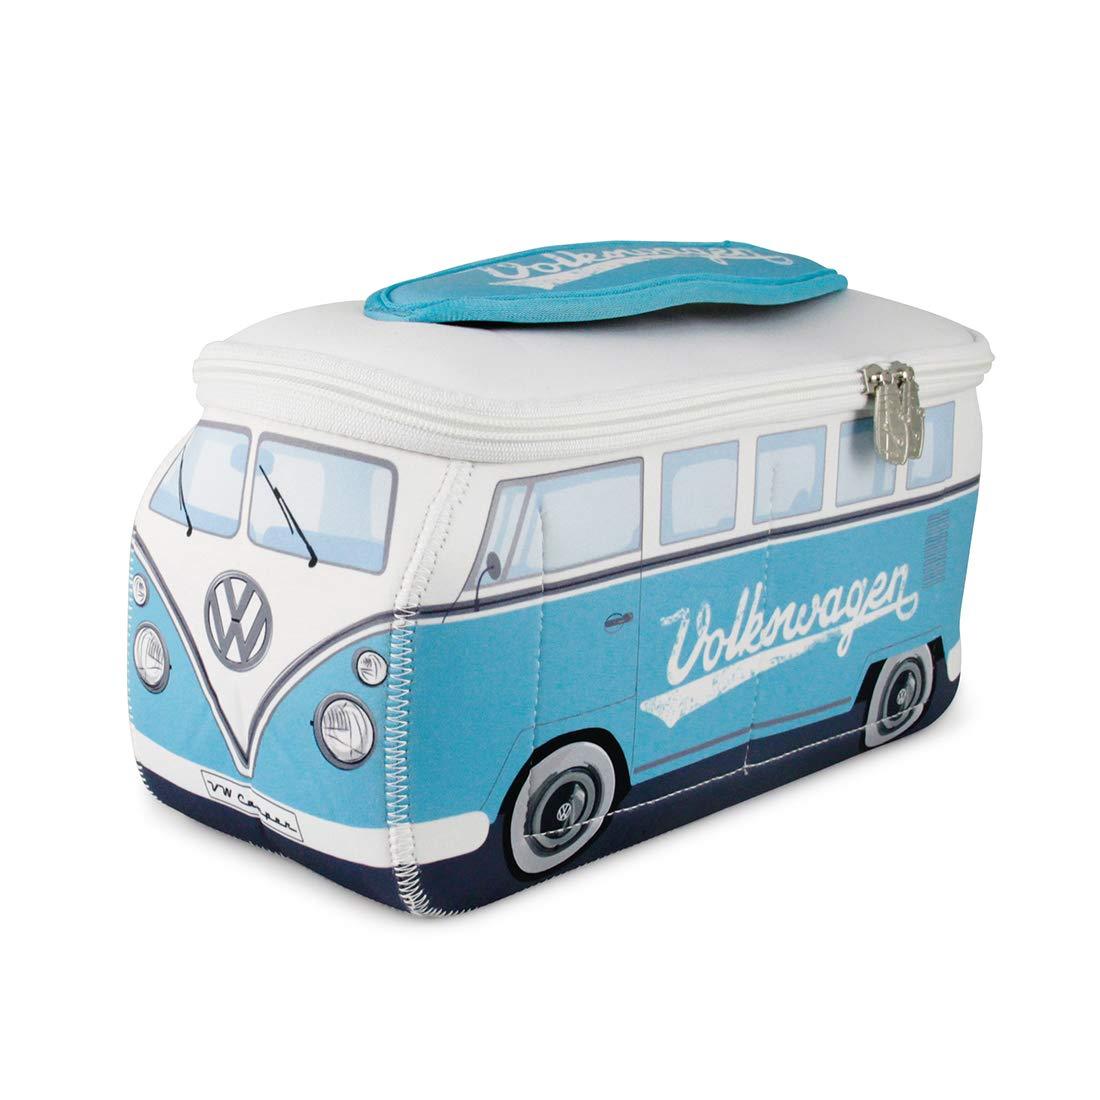 BRISA VW Collection VW T1 Bus 3D Neoprene Universal Bag - Turquoise